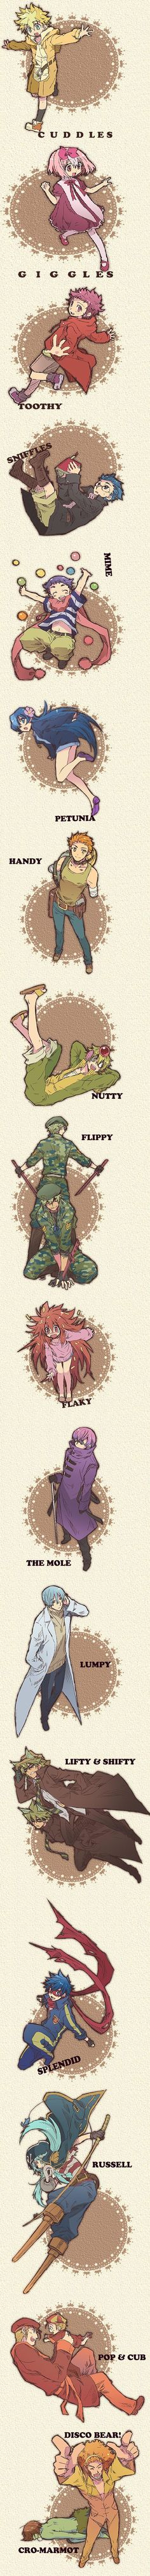 Tags: Anime, Giggles (HTF), Happy Tree Friends, The Mole (HTF), Mime (HTF)